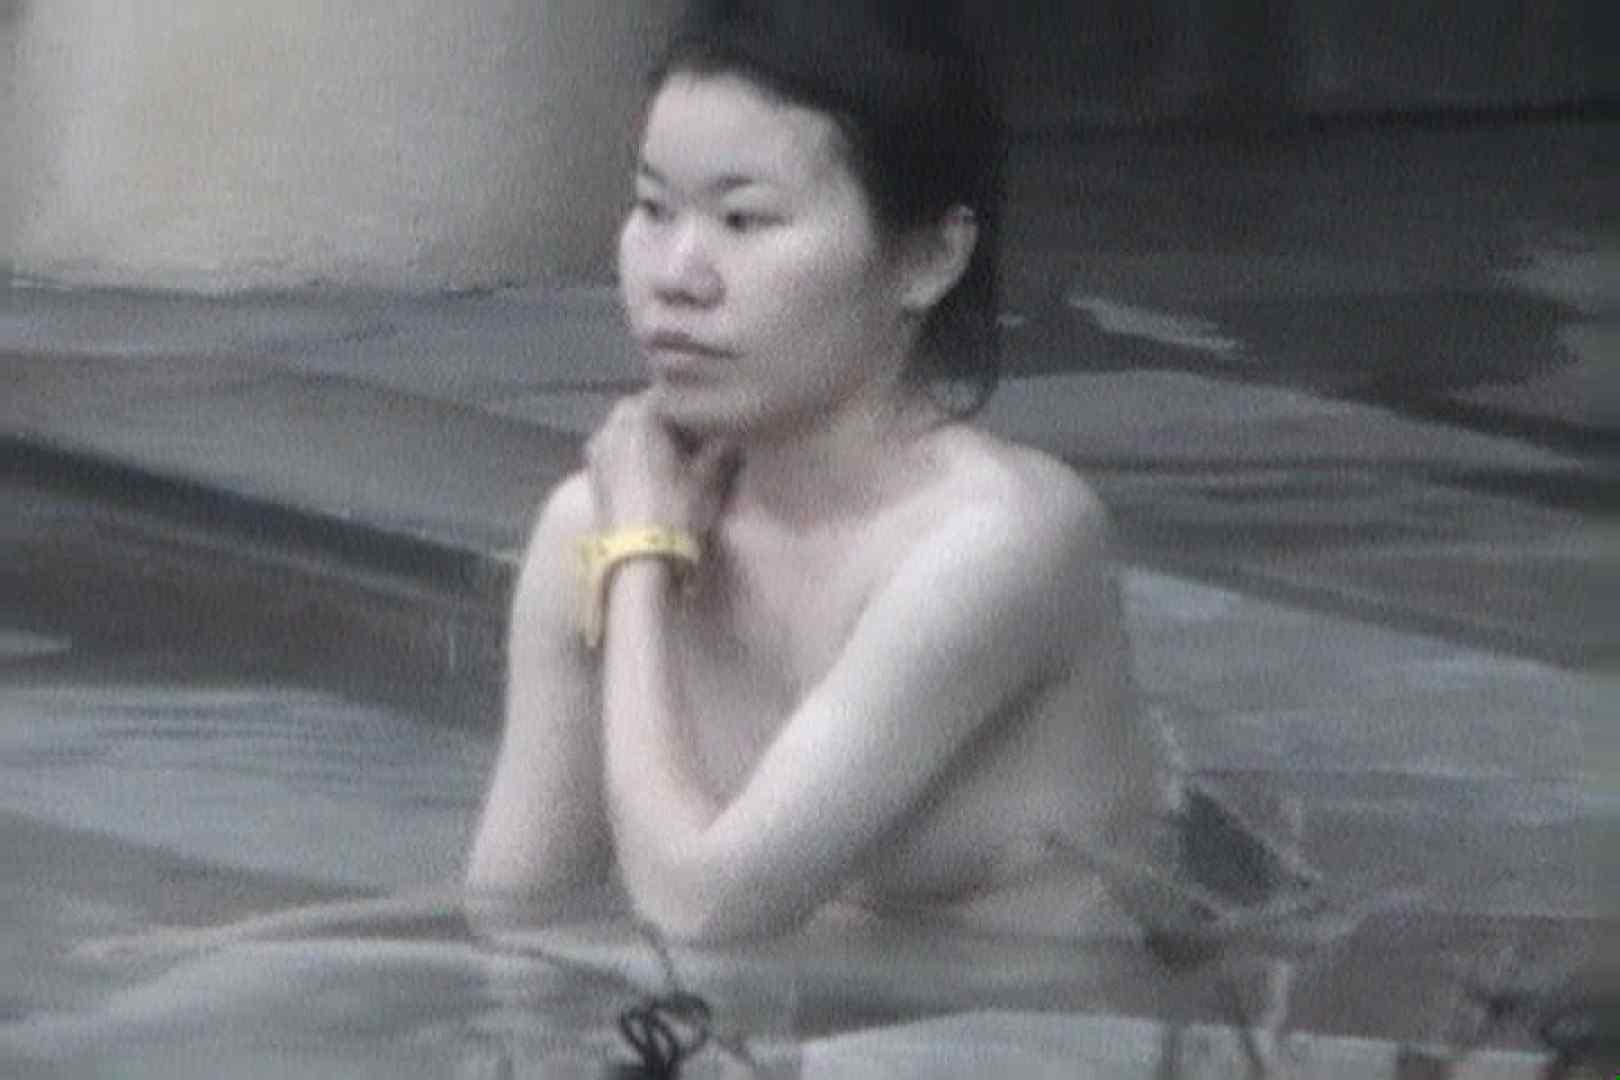 Aquaな露天風呂Vol.556 露天風呂編 | 盗撮シリーズ  99PIX 53